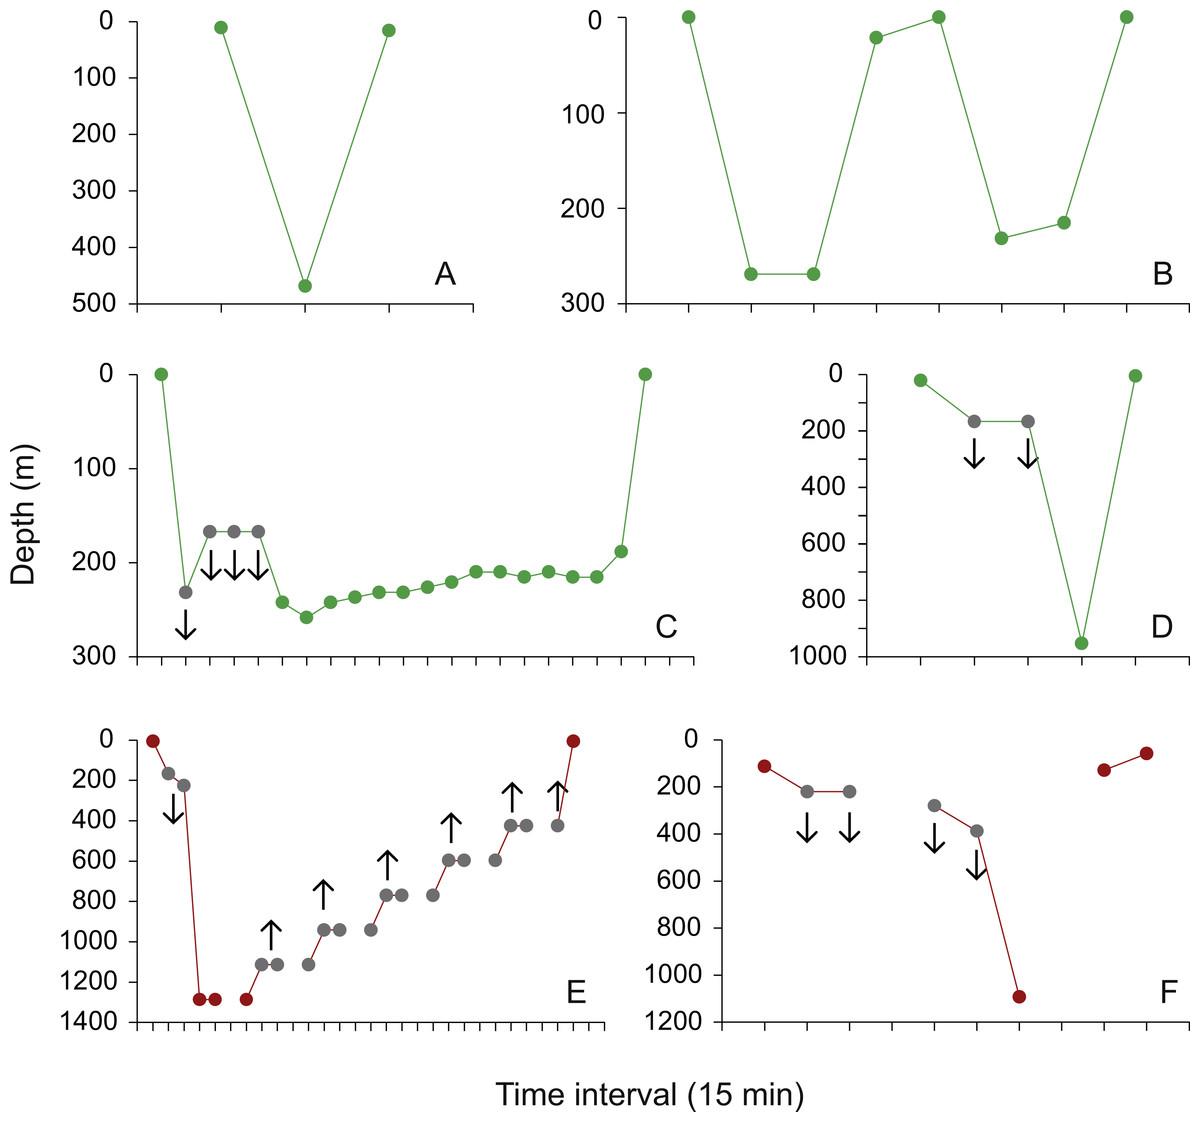 oceanic adults coastal juveniles tracking the habitat use of whale rh peerj com